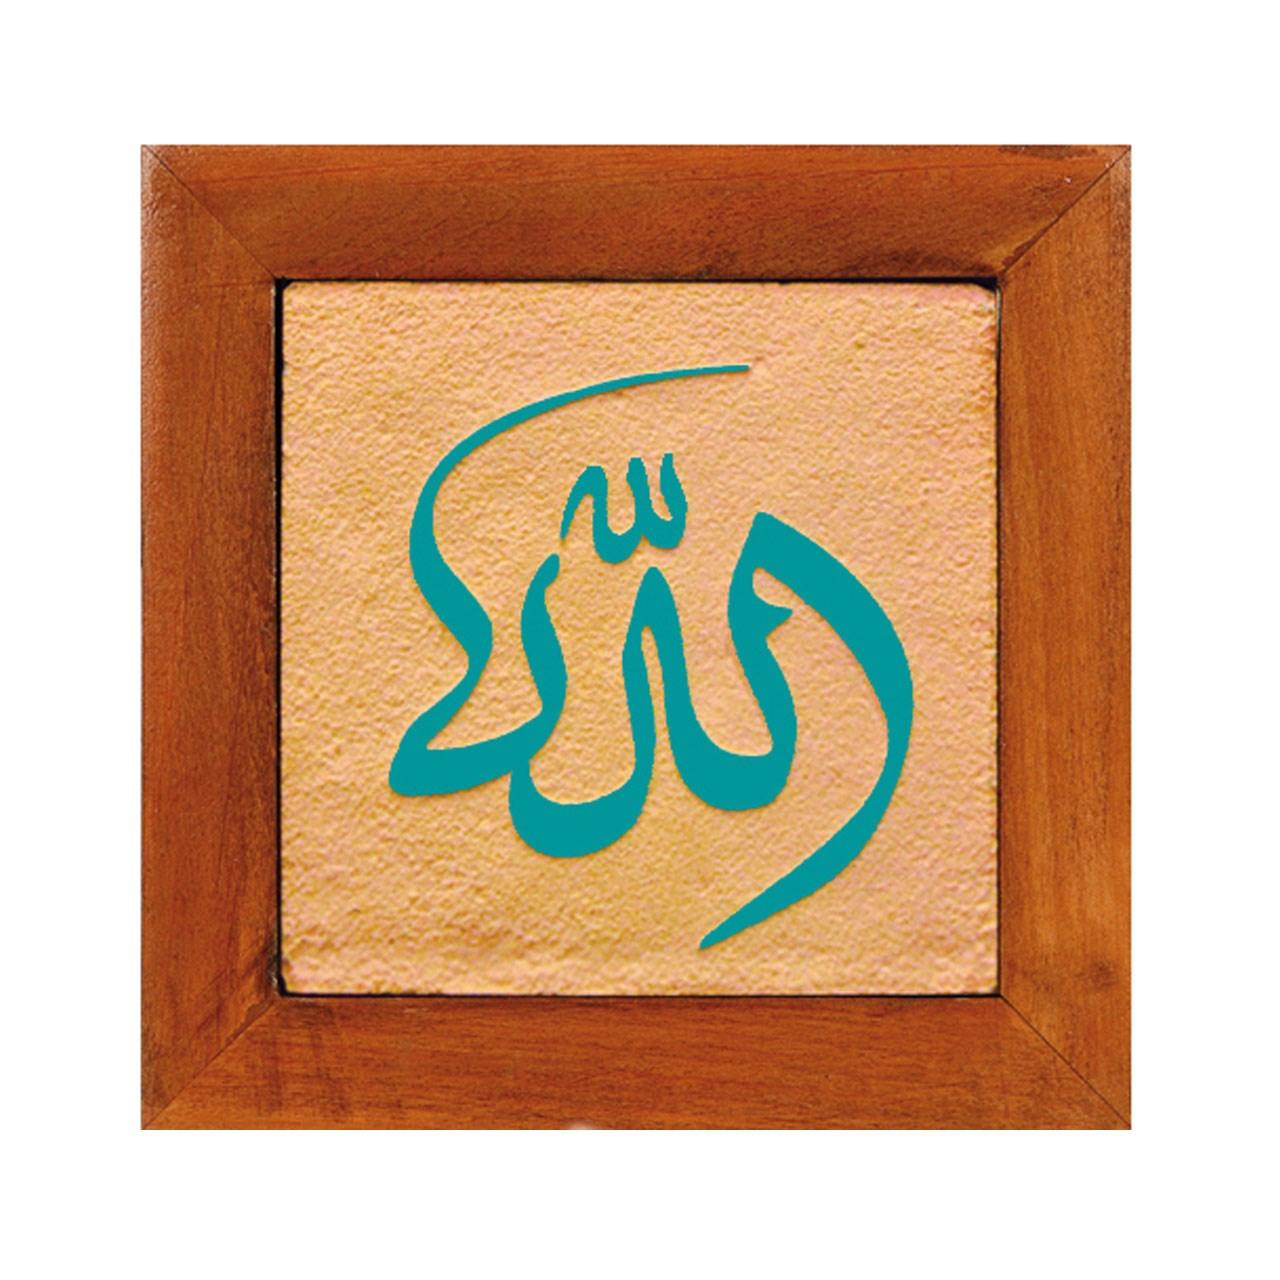 تابلو کاشی سلام مجموعه جلی طرح ذکر جلاله الله